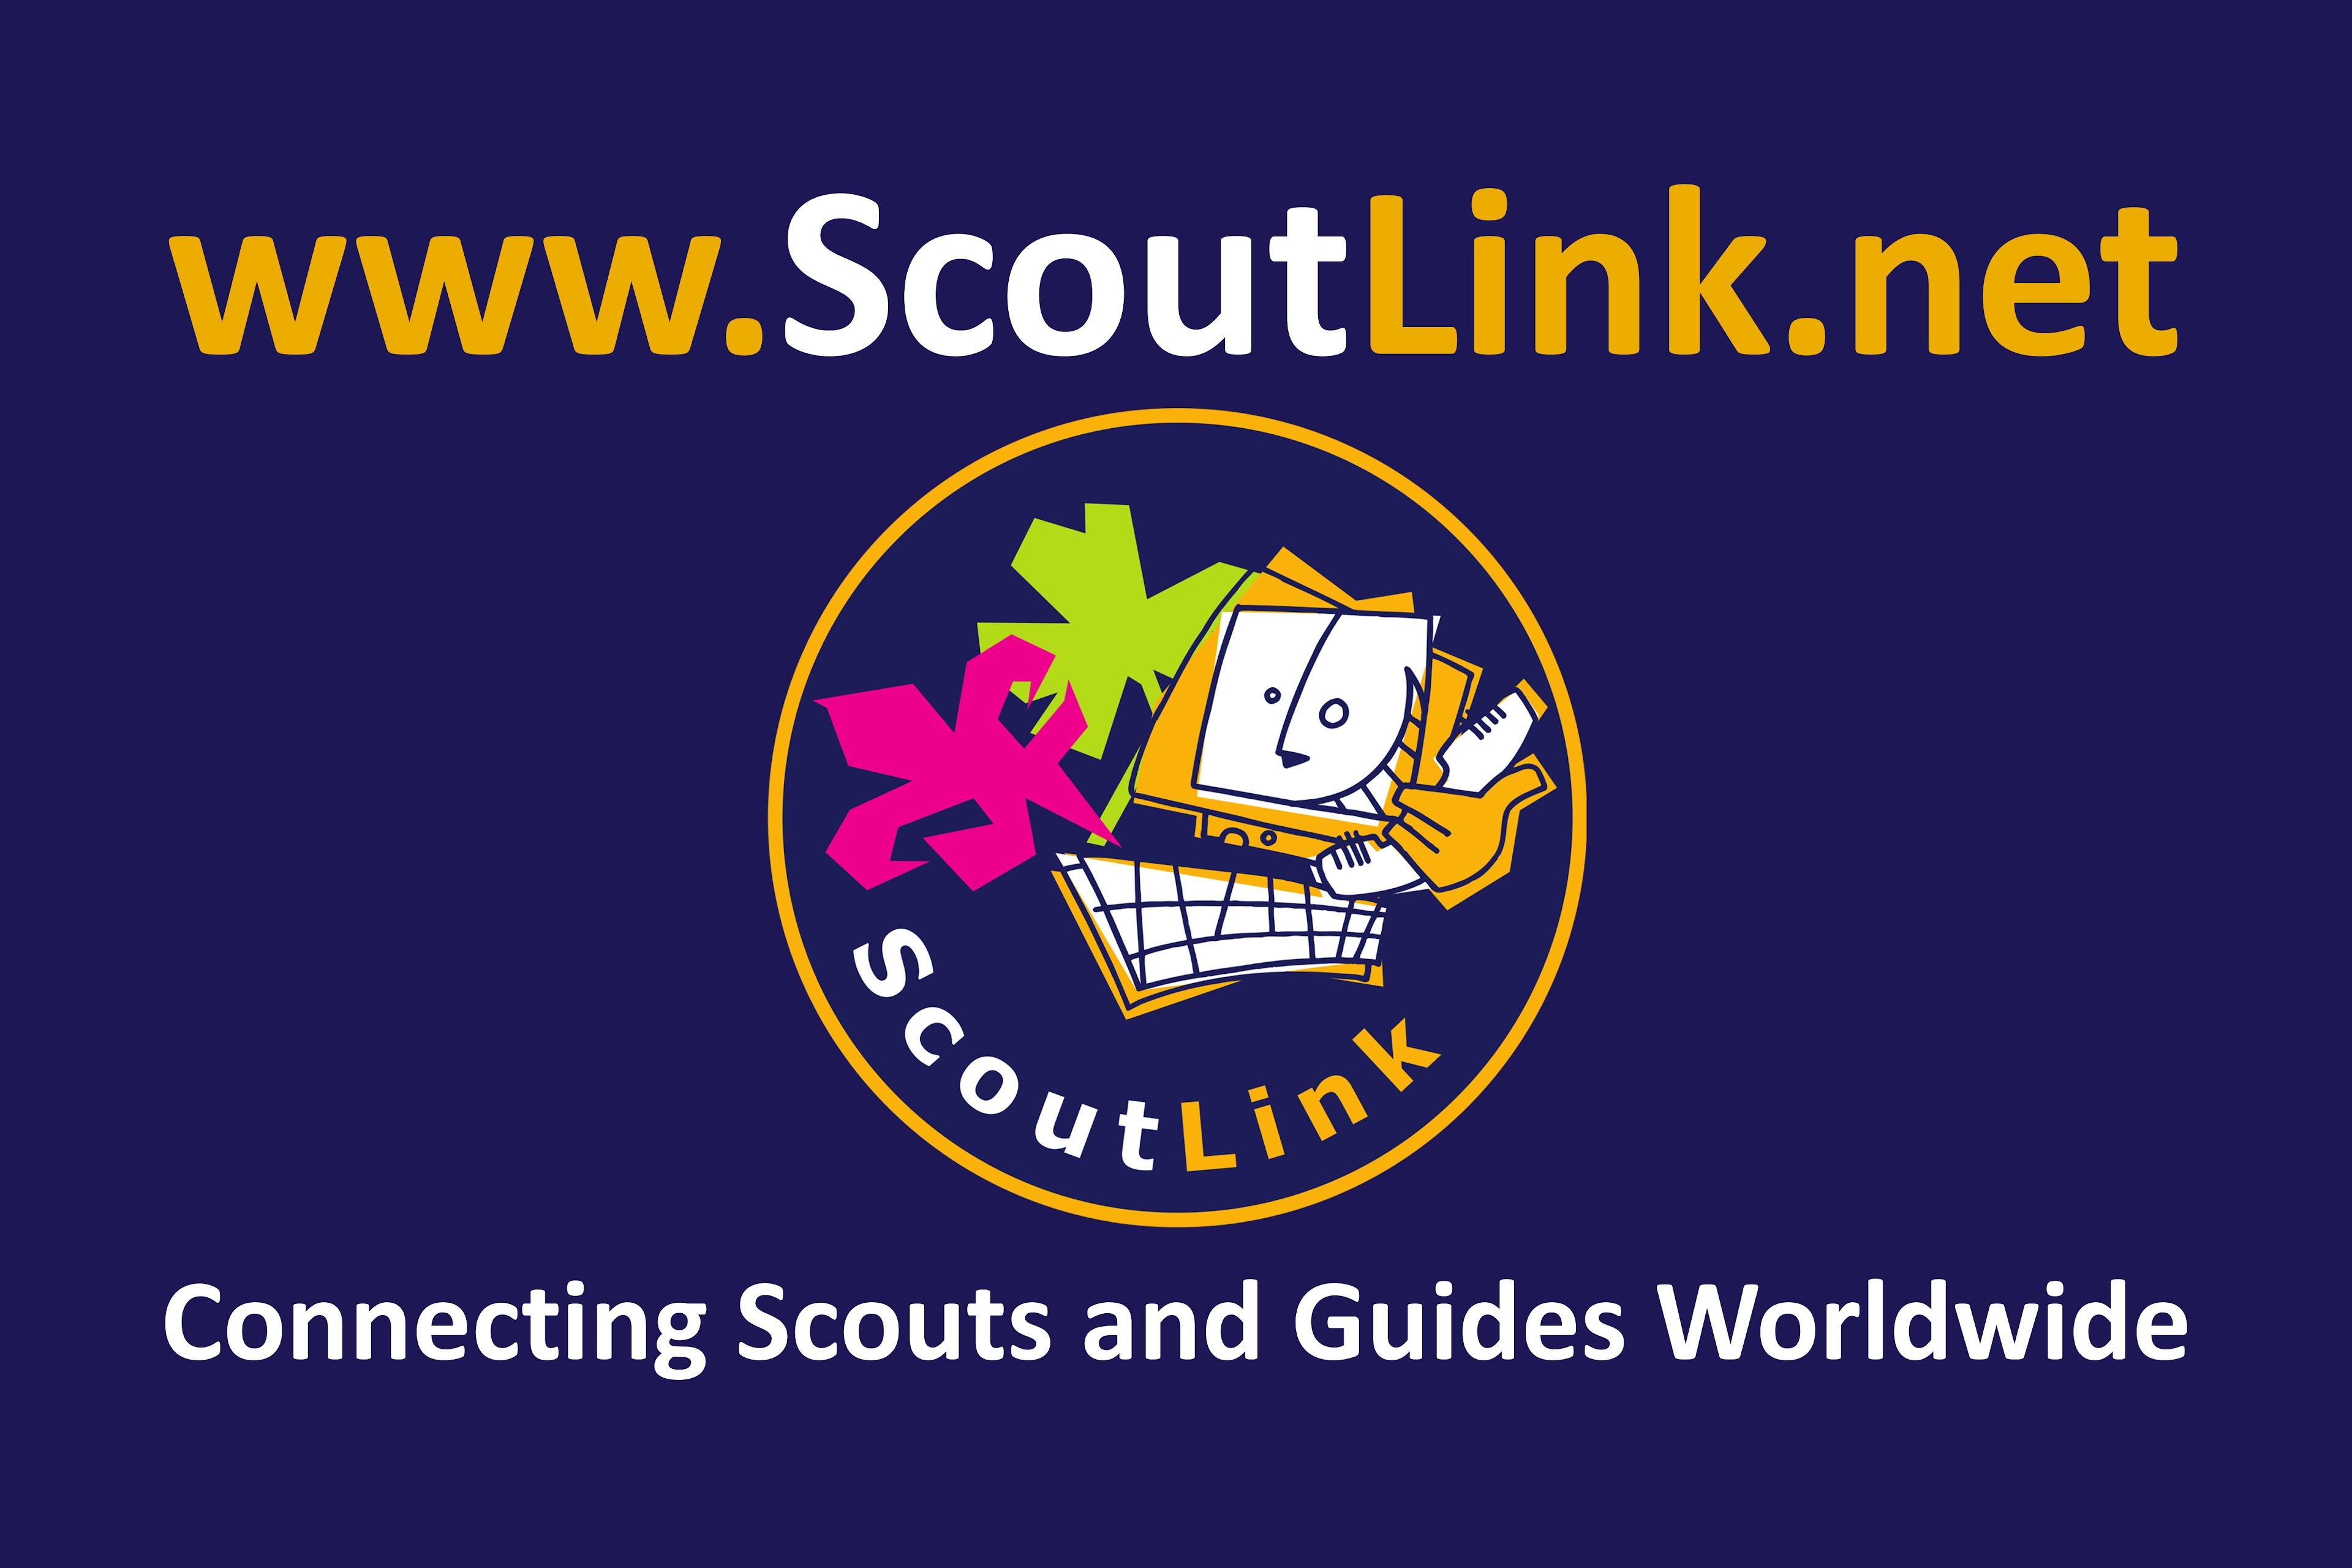 Scoutlink